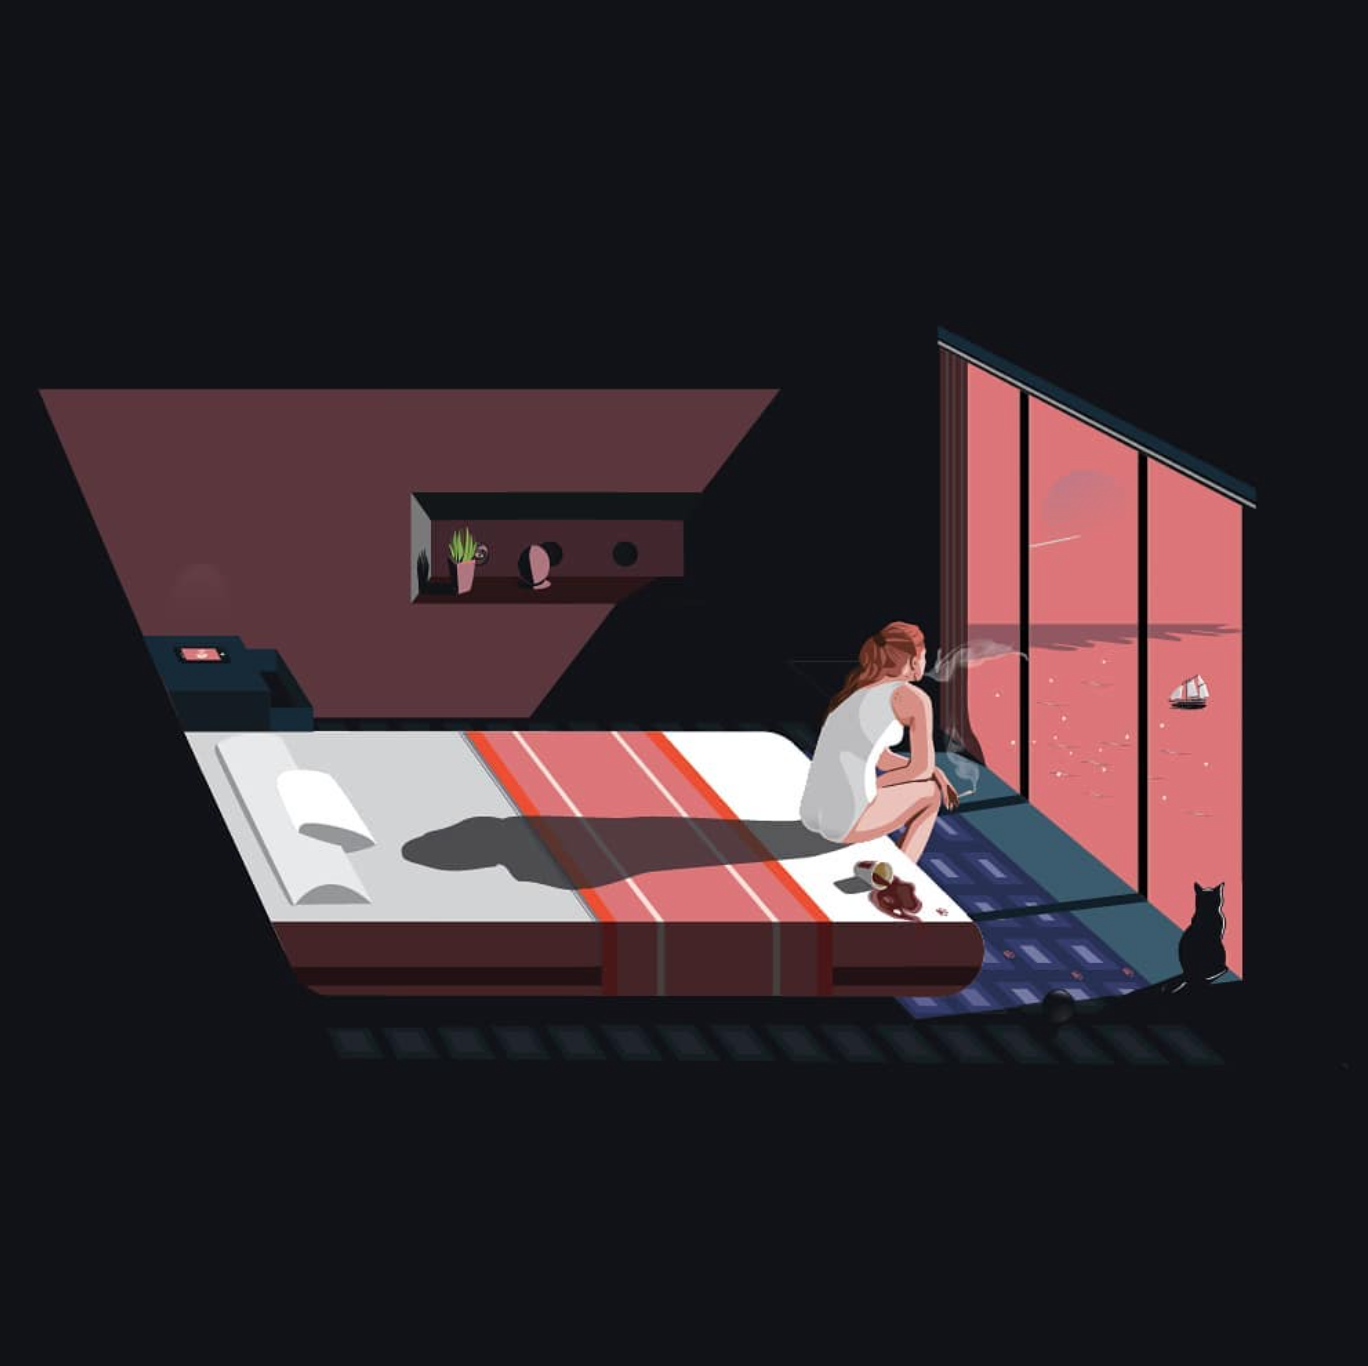 art:  niko_dola/instagram